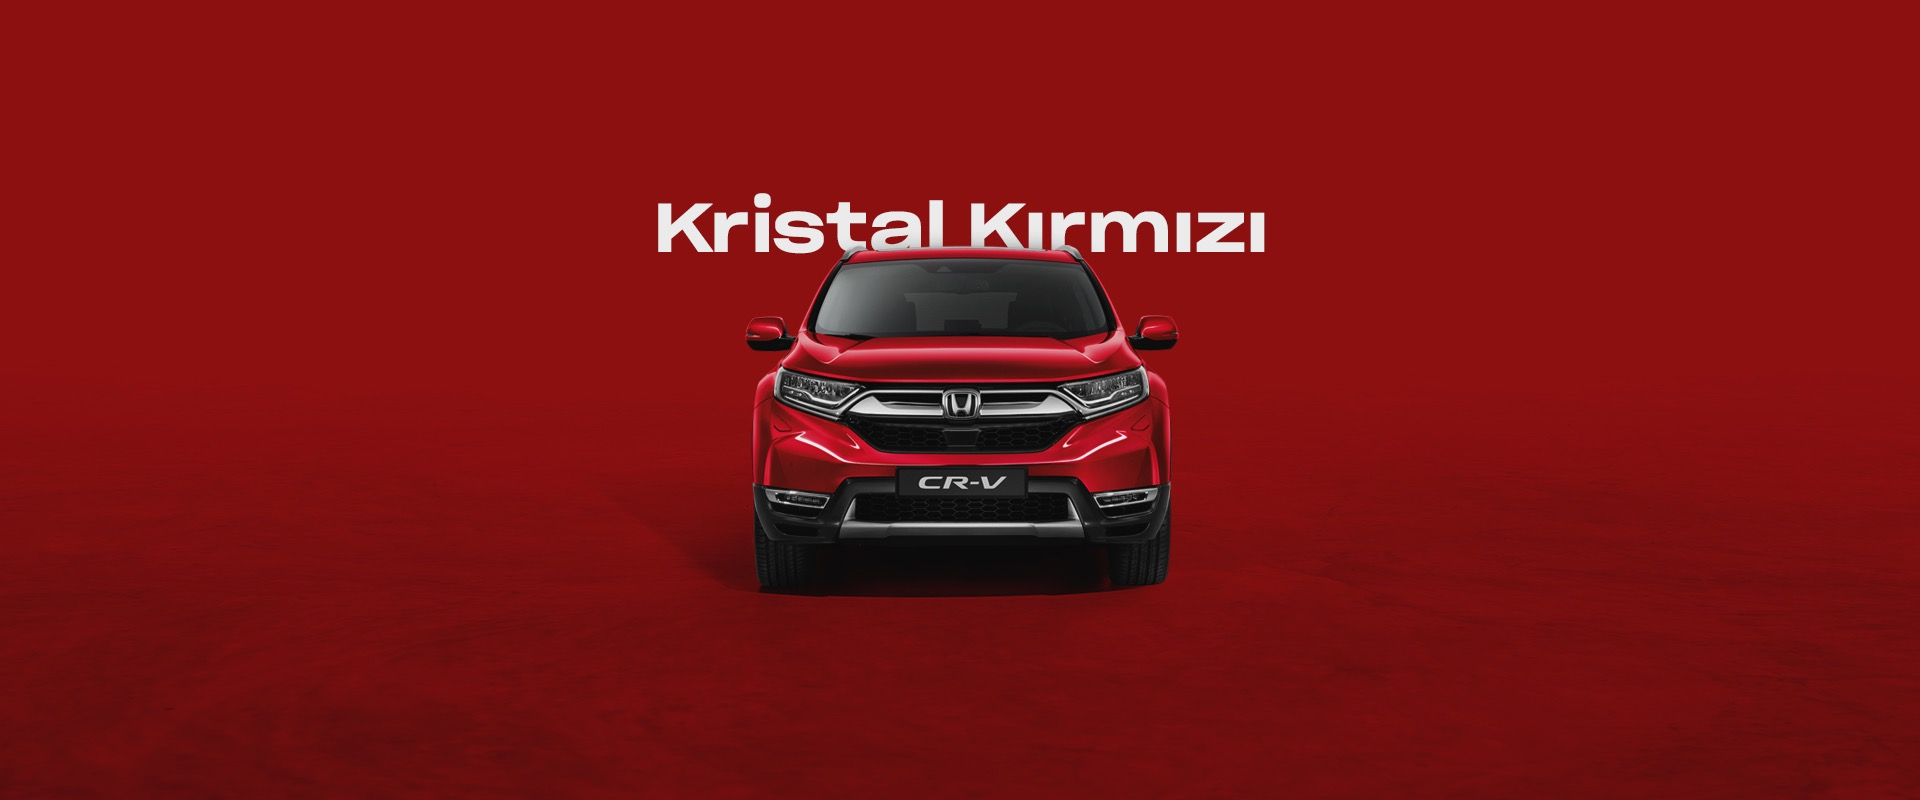 Honda Plaza  Nitko Kristal Kırmızı